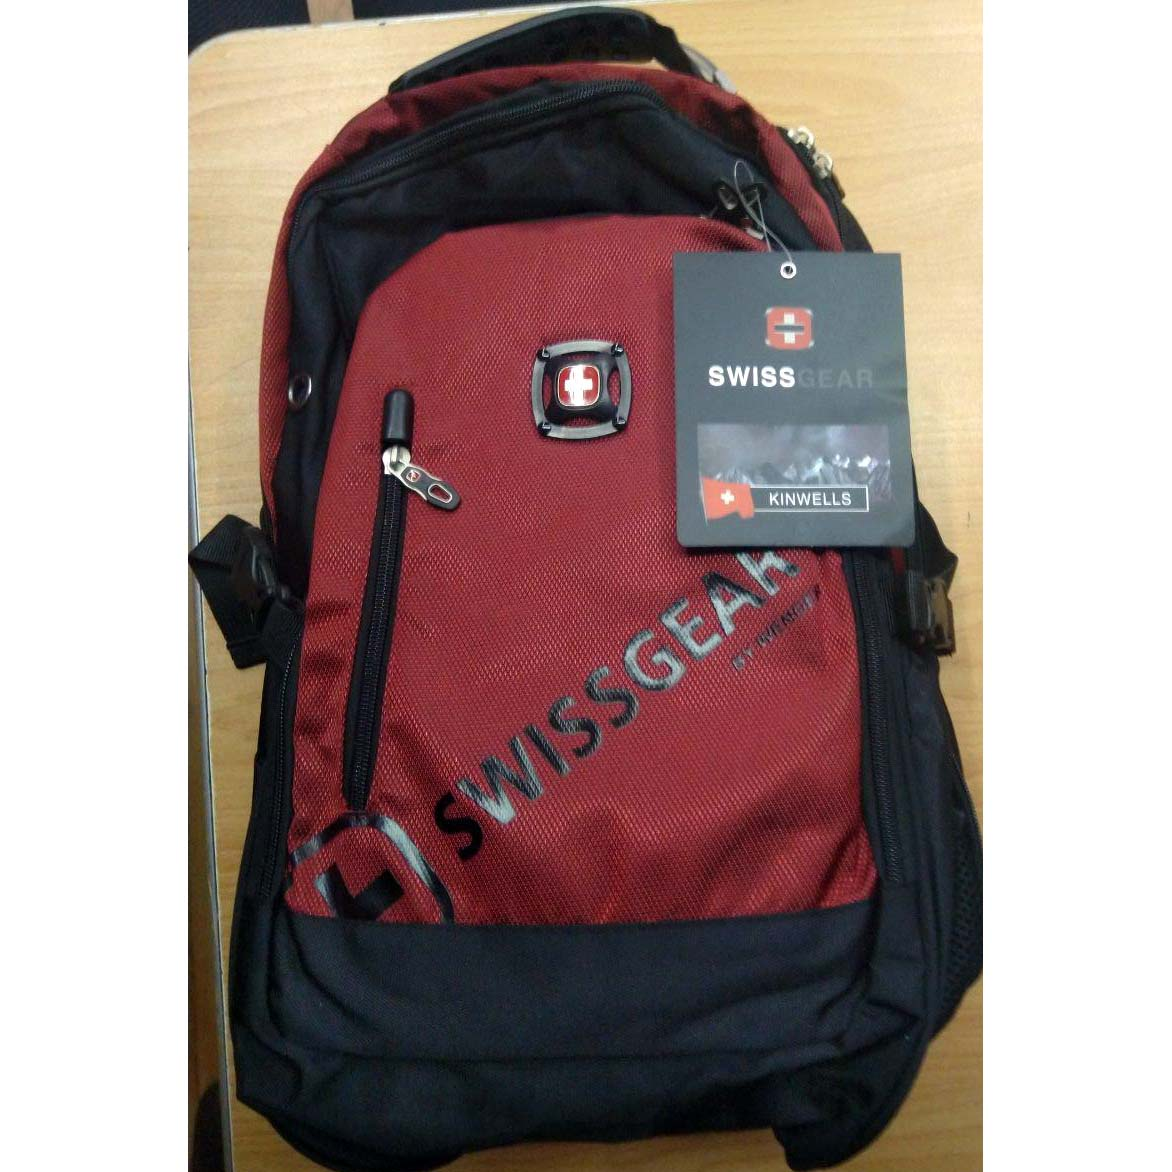 NOTEBOOK BAG SWISSCEAR BACK COLOR 15.6 صوت+USB ظهر+تطويلة ,Laptop Bag